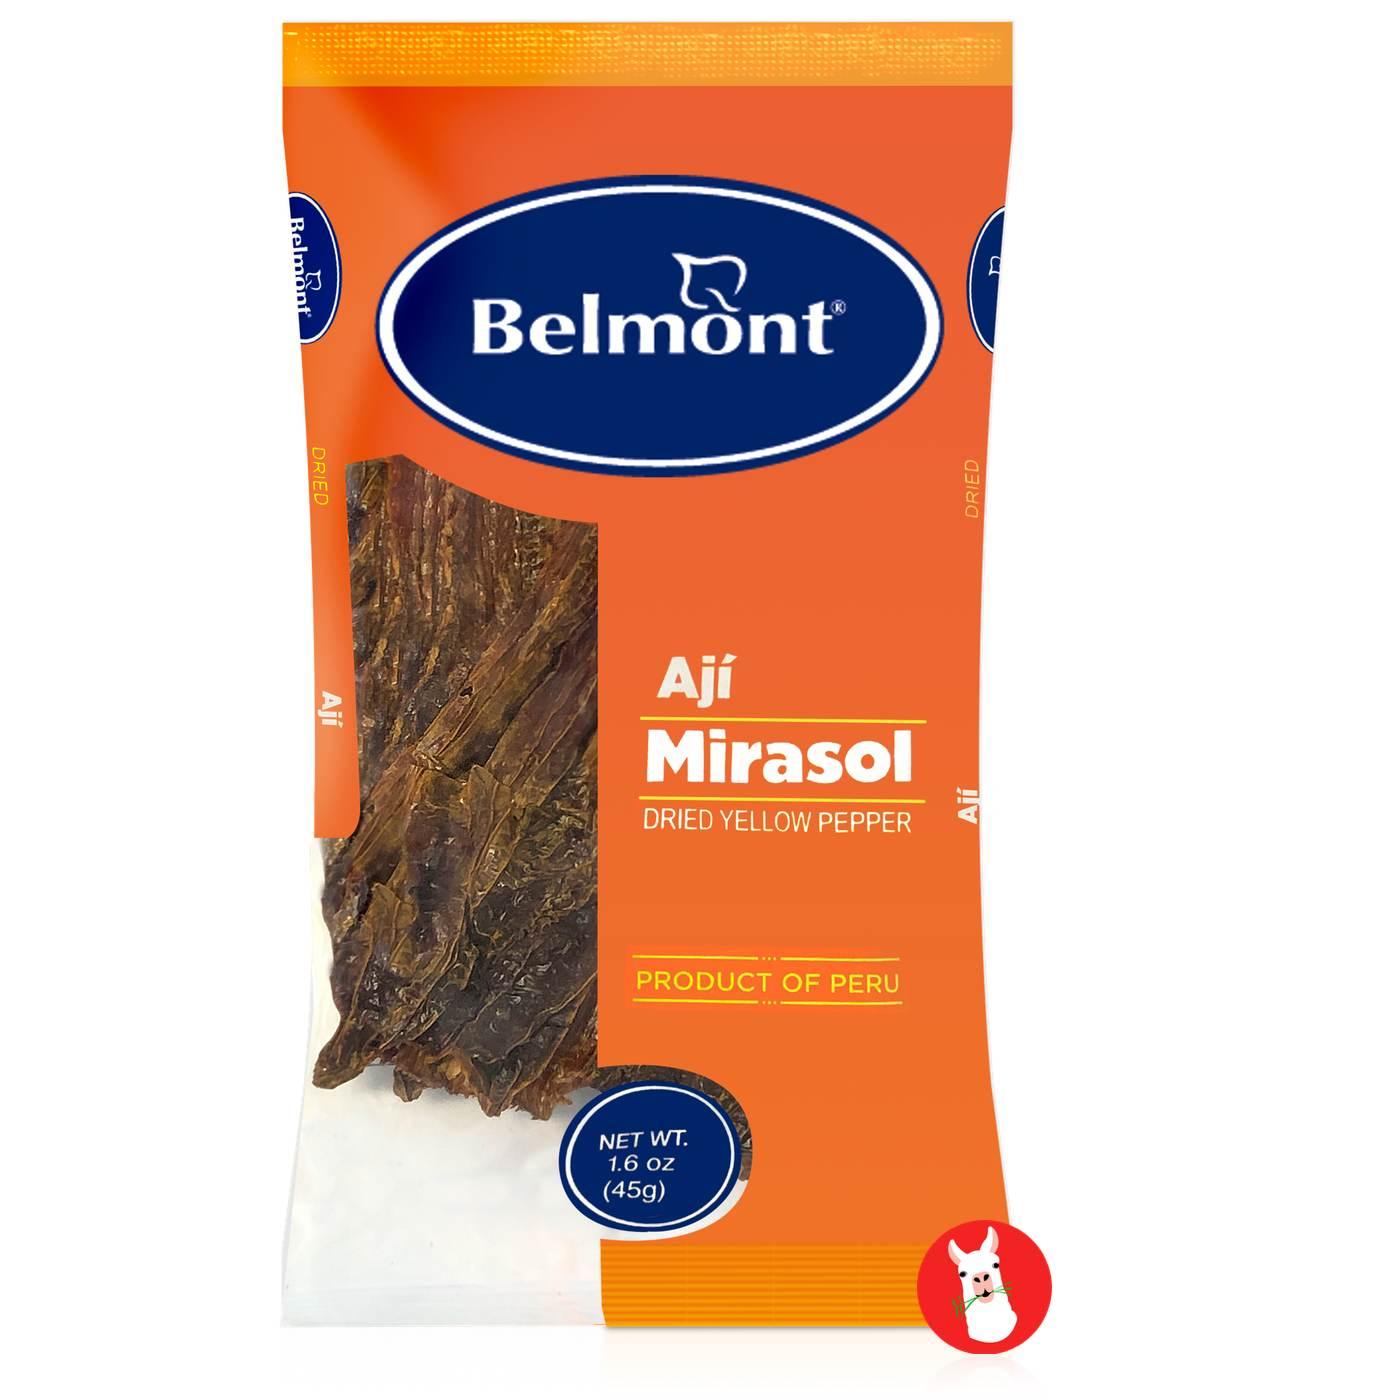 Belmont Aji Mirasol Seco